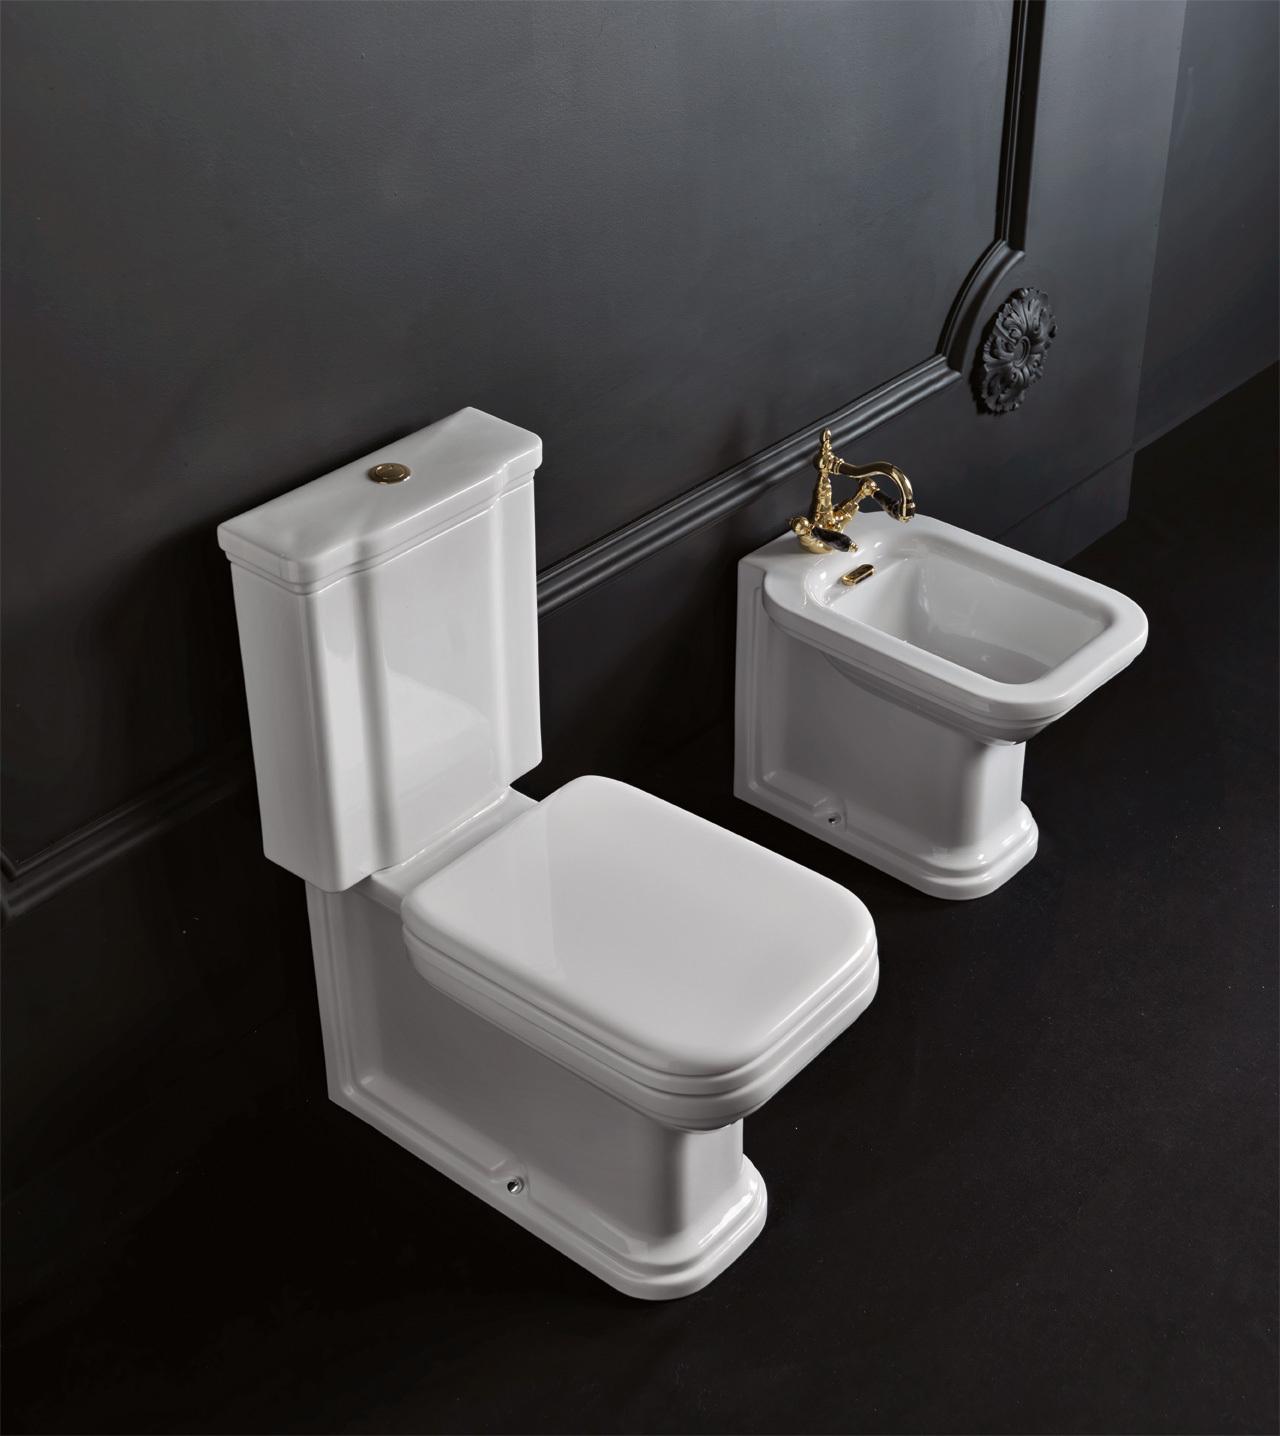 Antik bad bilder badelaedchen - Toilette retro ...